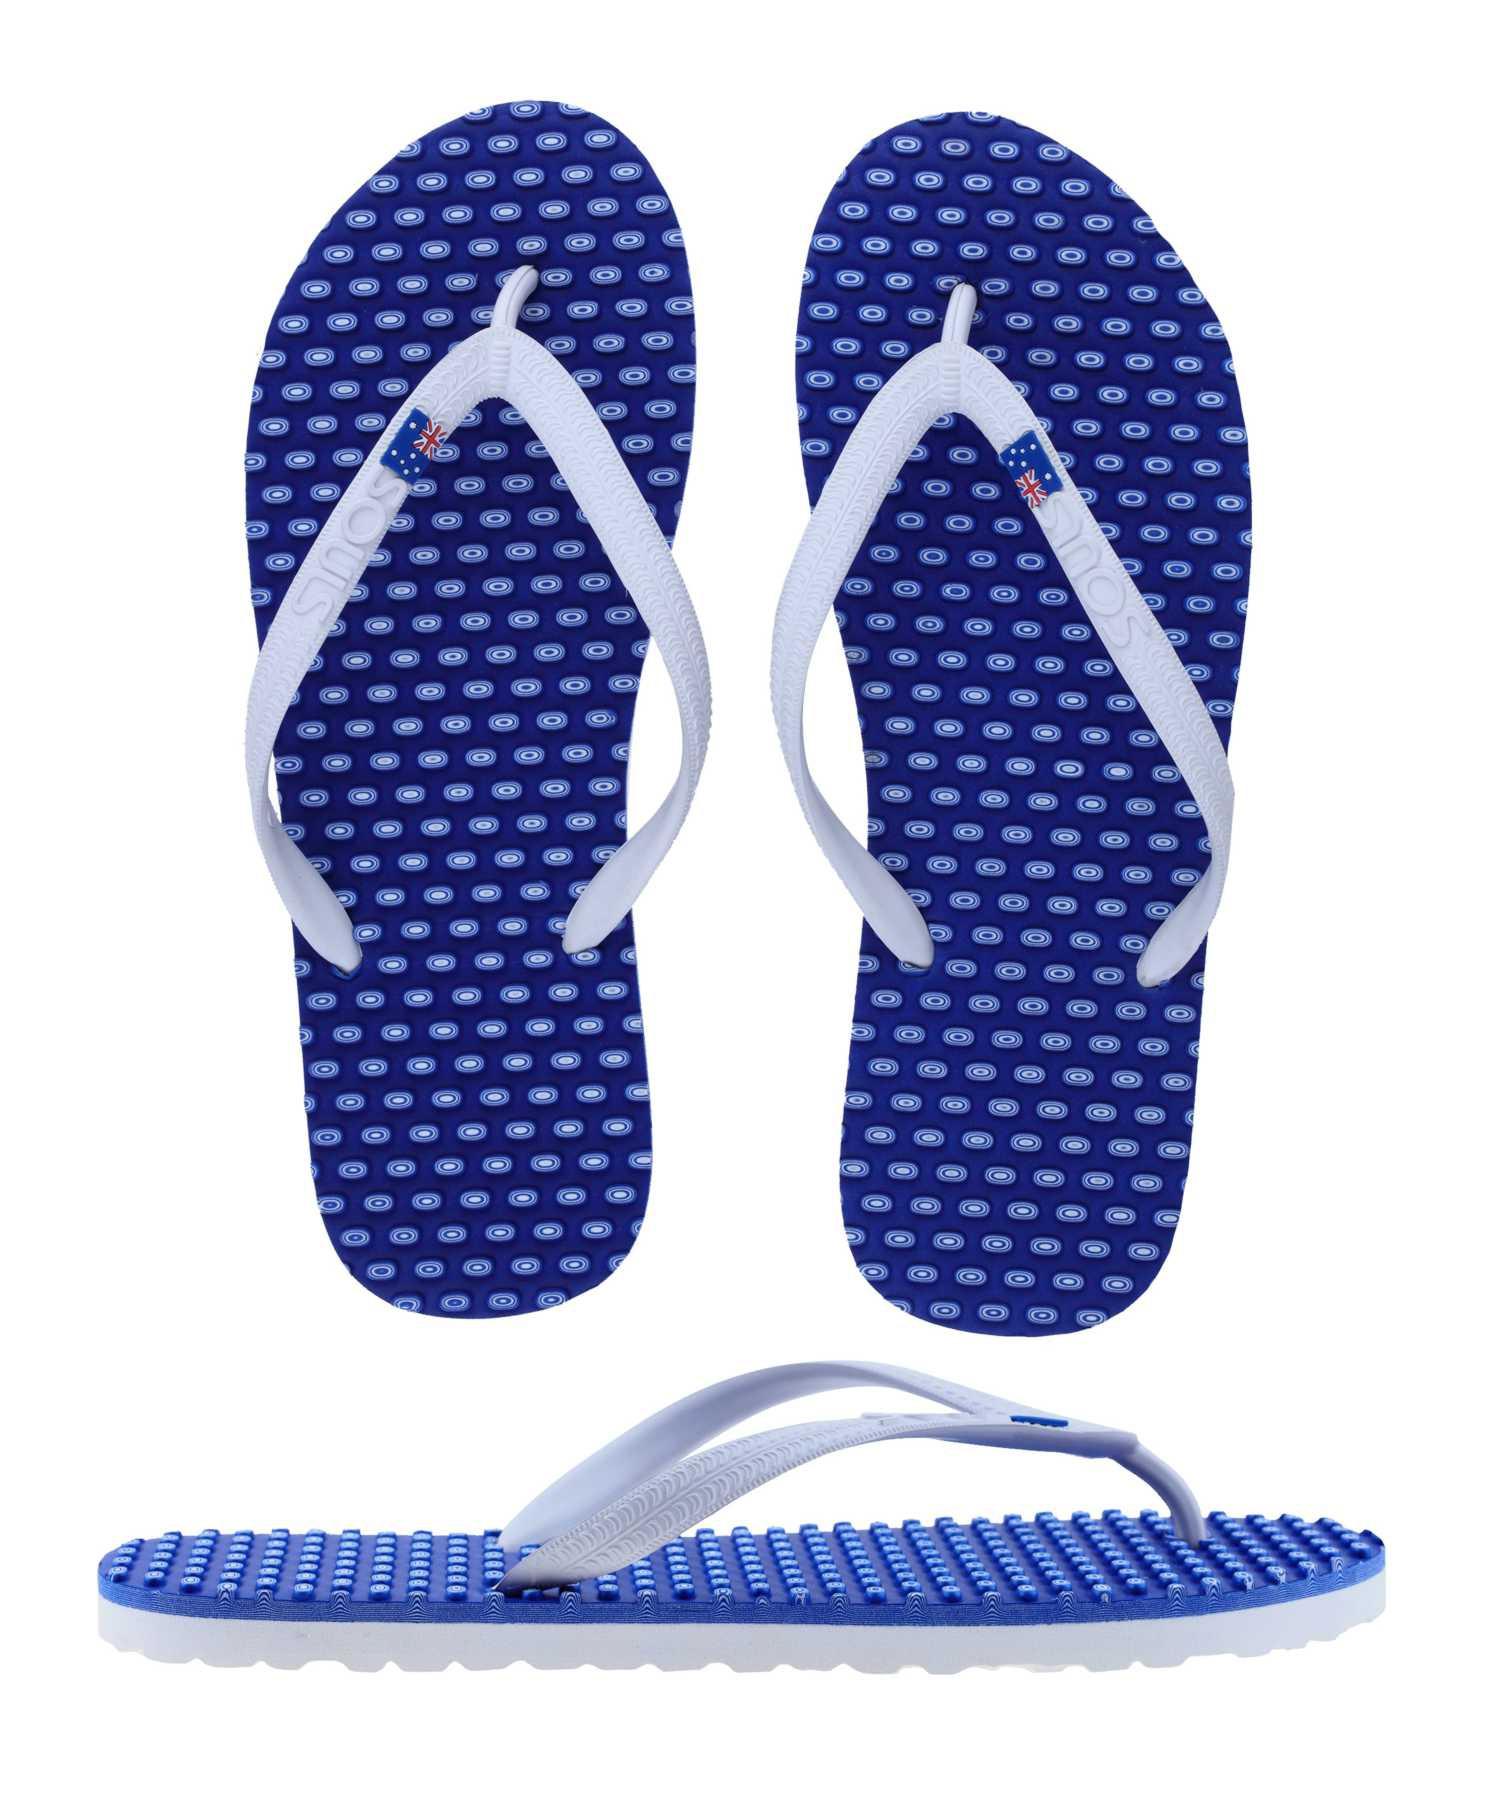 "SOULS Australian Thongs Zehentrenner Unisex Comfort Massage Sohle ""Barrier Reef Blue"" Sandale"